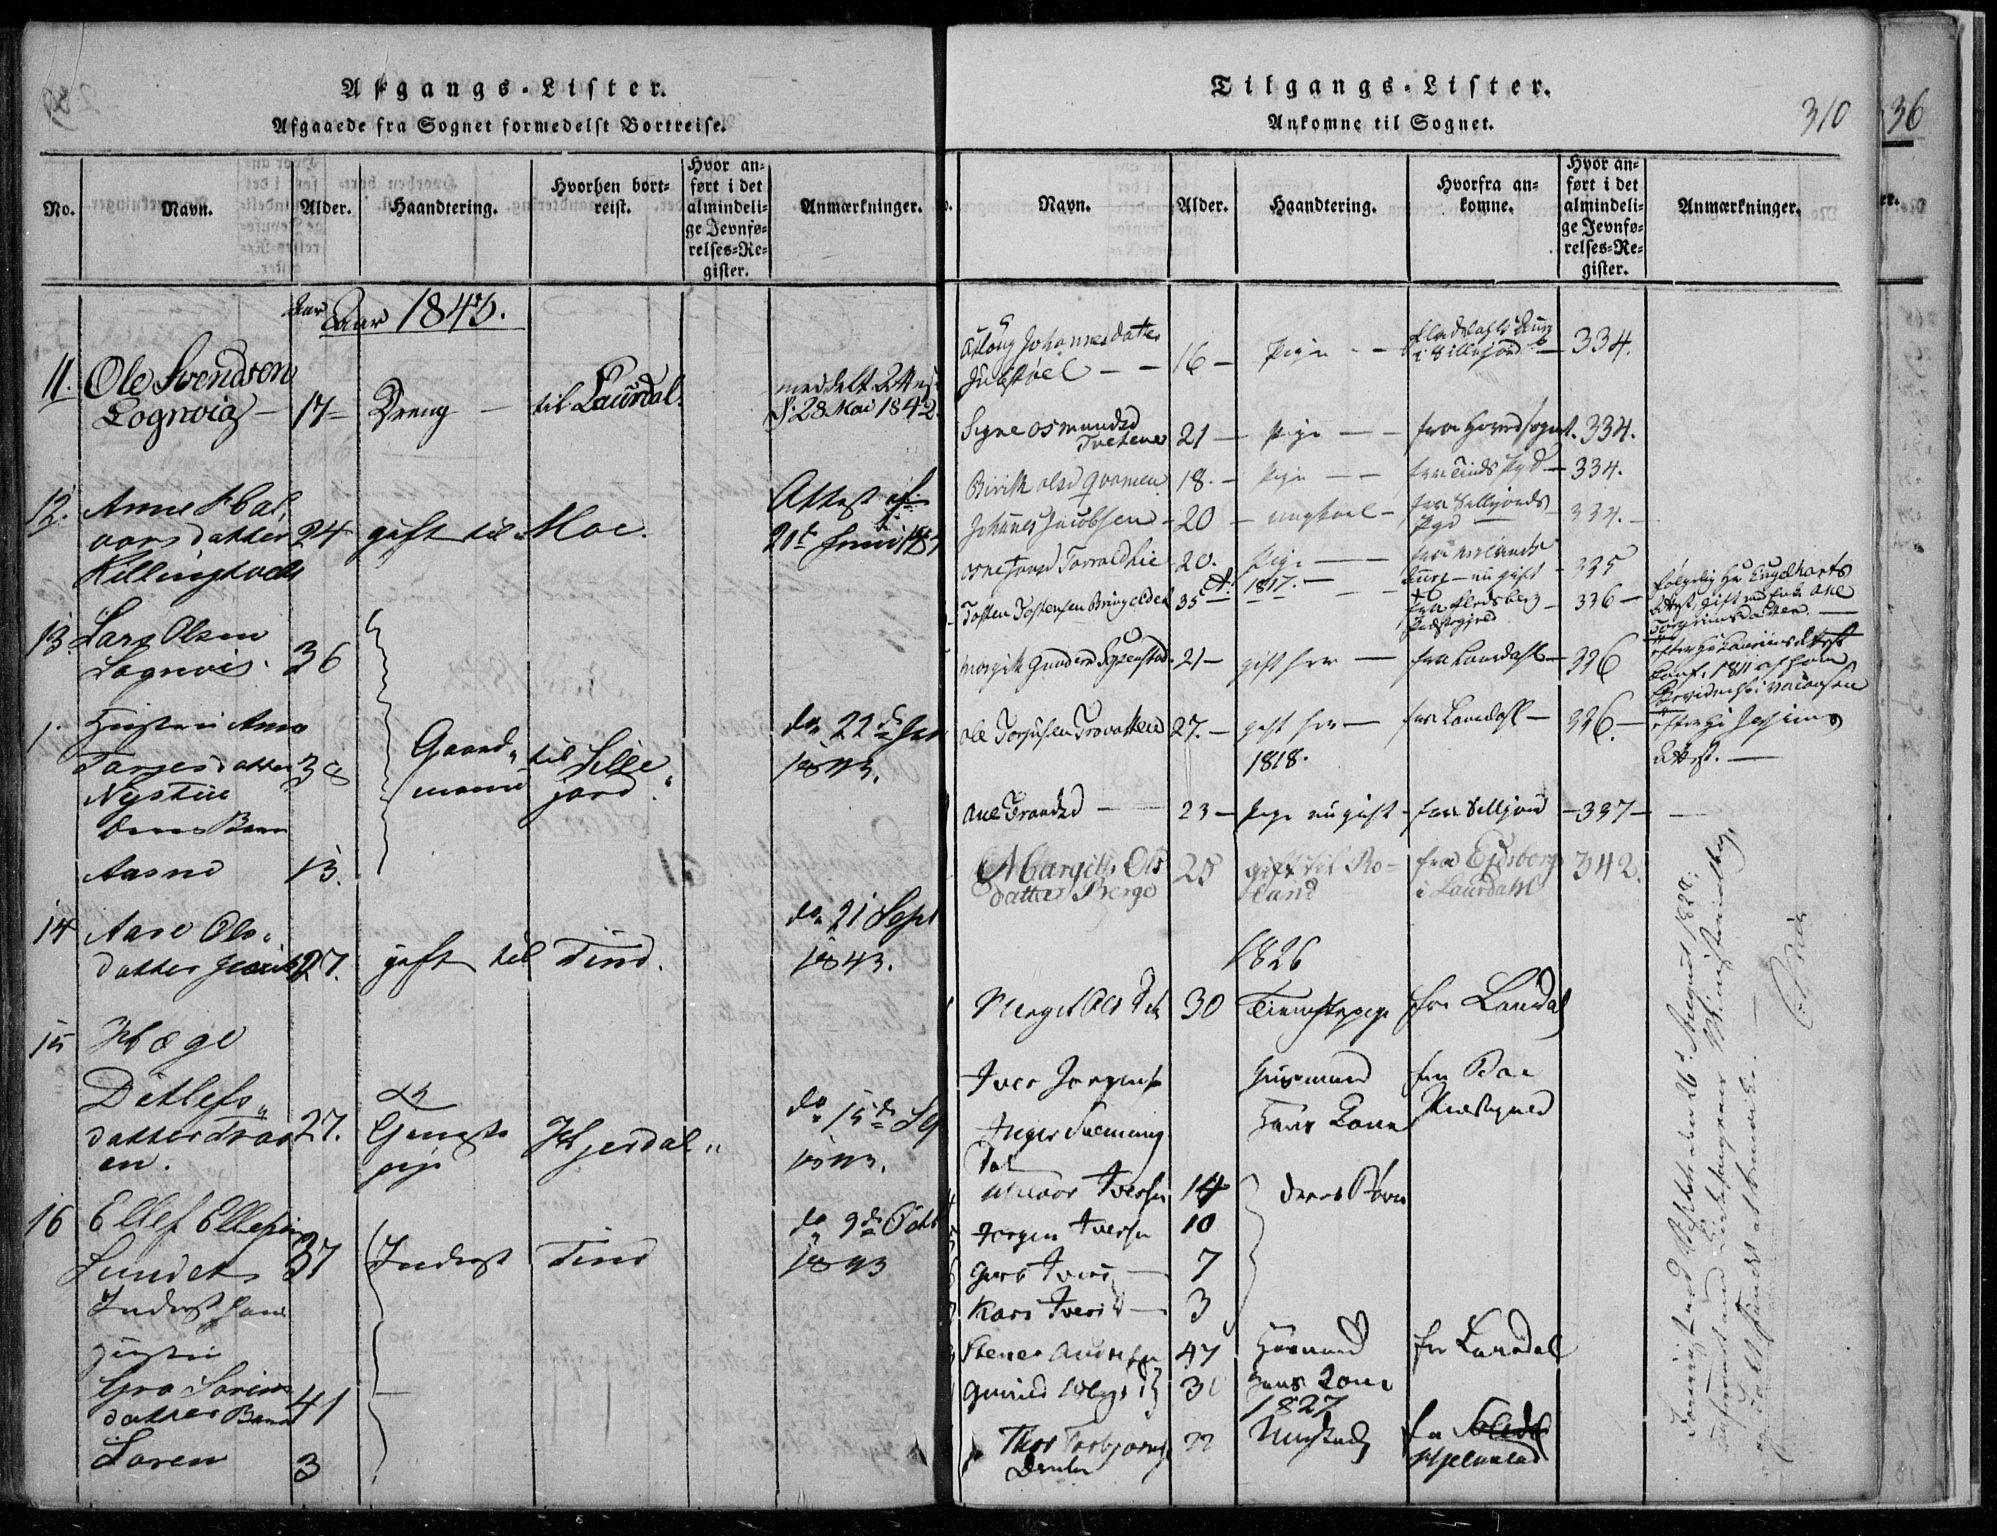 SAKO, Rauland kirkebøker, F/Fa/L0001: Ministerialbok nr. 1, 1814-1859, s. 310